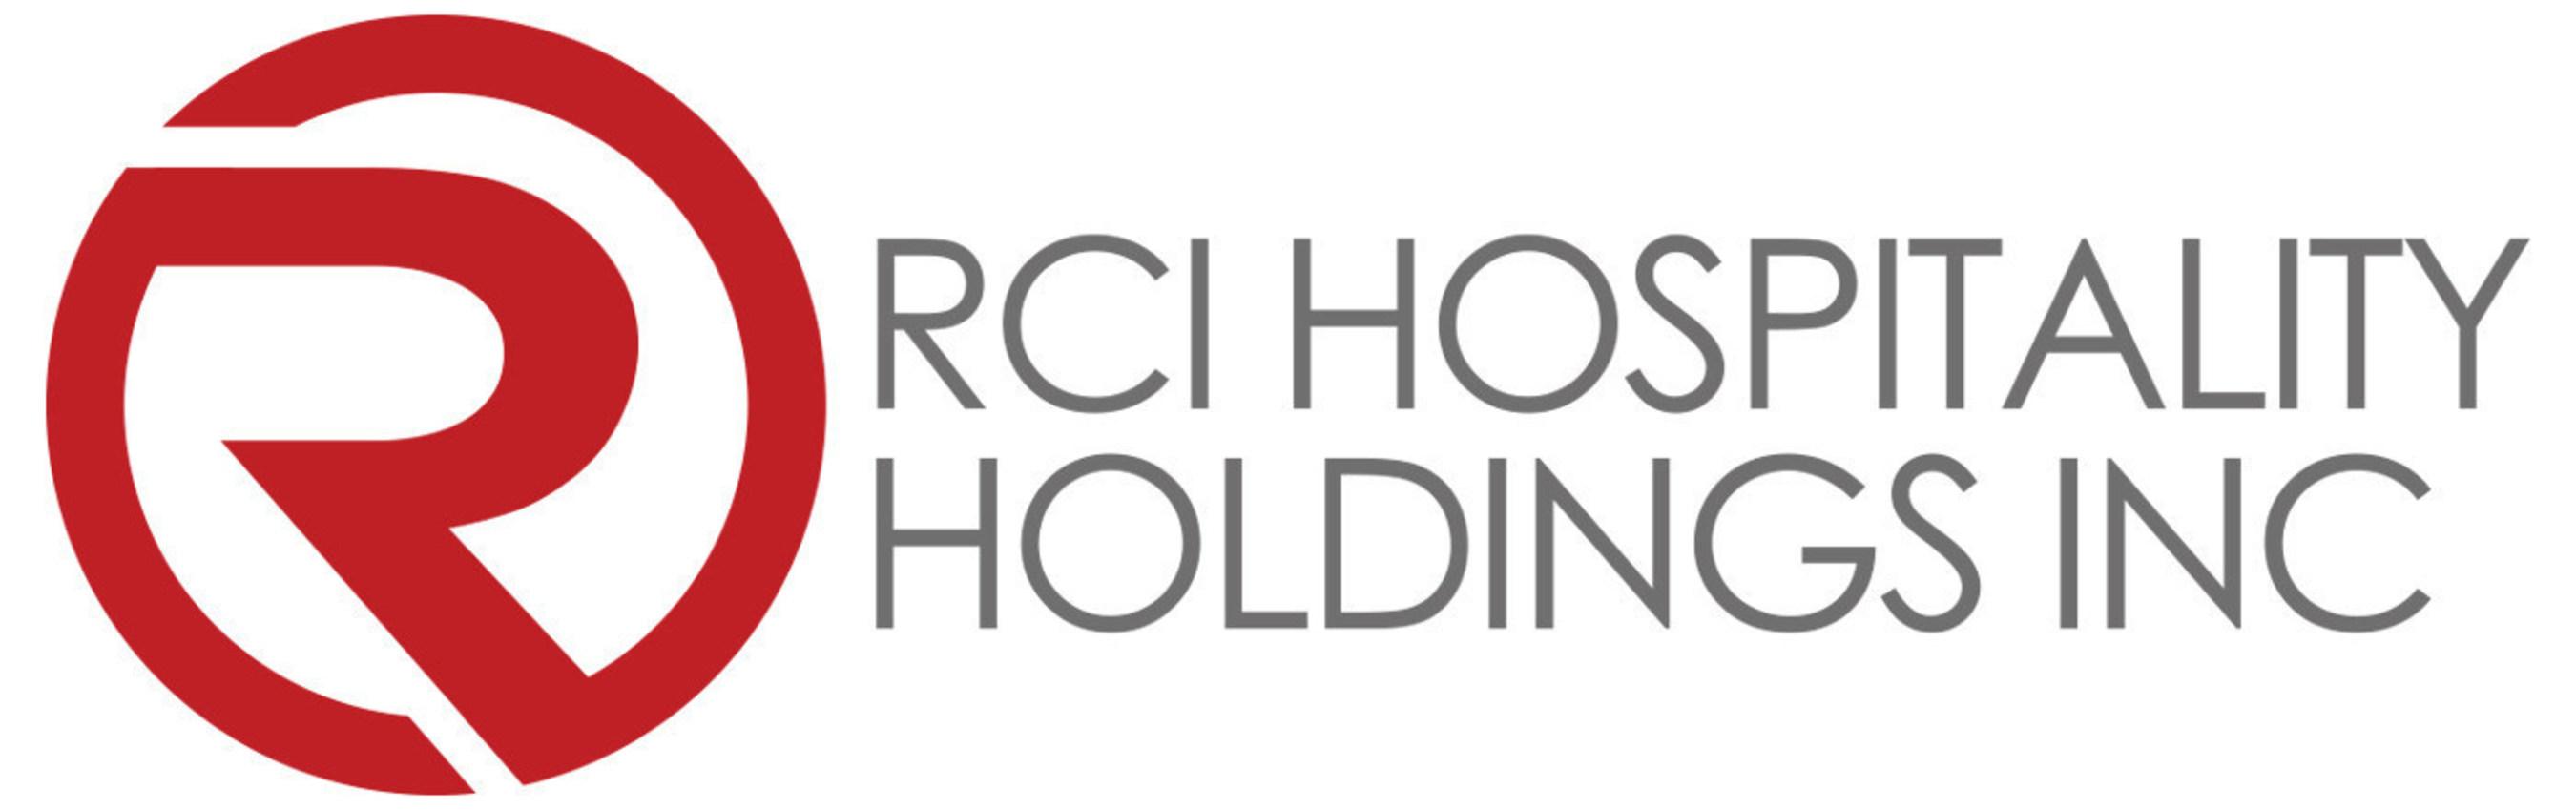 RCI Hospitality Holdings Corporate Logo (PRNewsFoto/RCI Hospitality Holdings, Inc.)